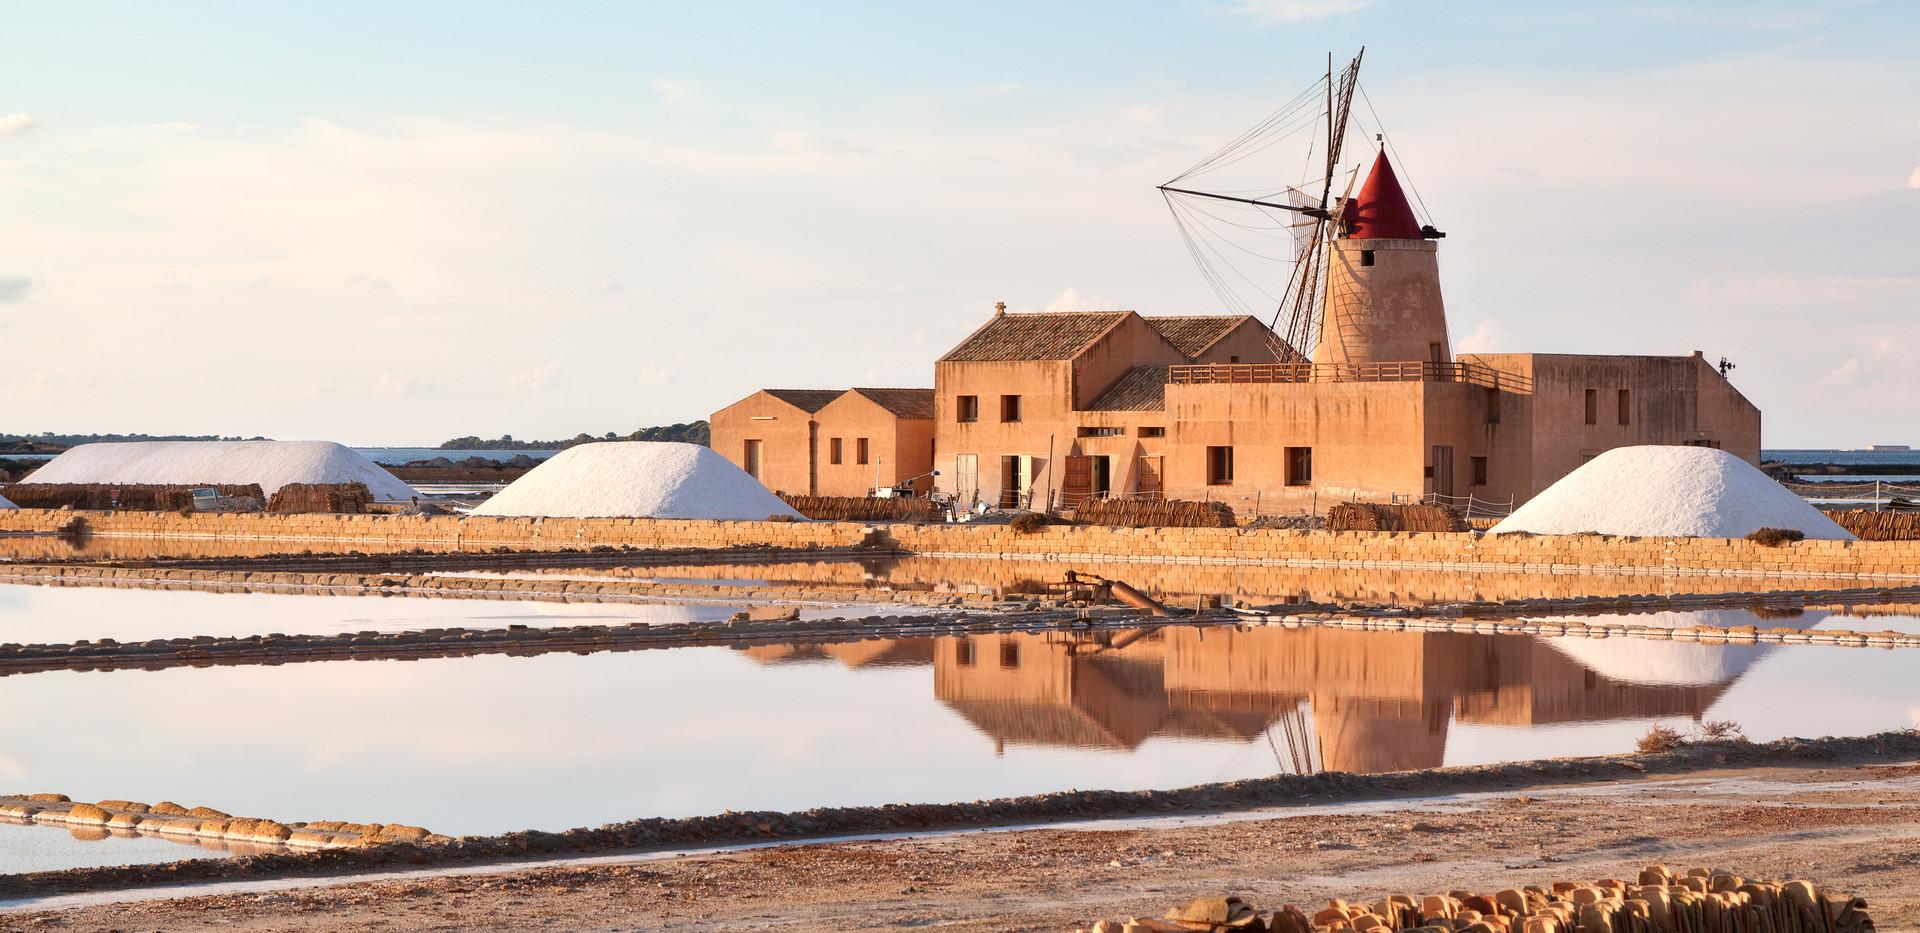 Windmühle in den Marsala Salt Flats.jpg